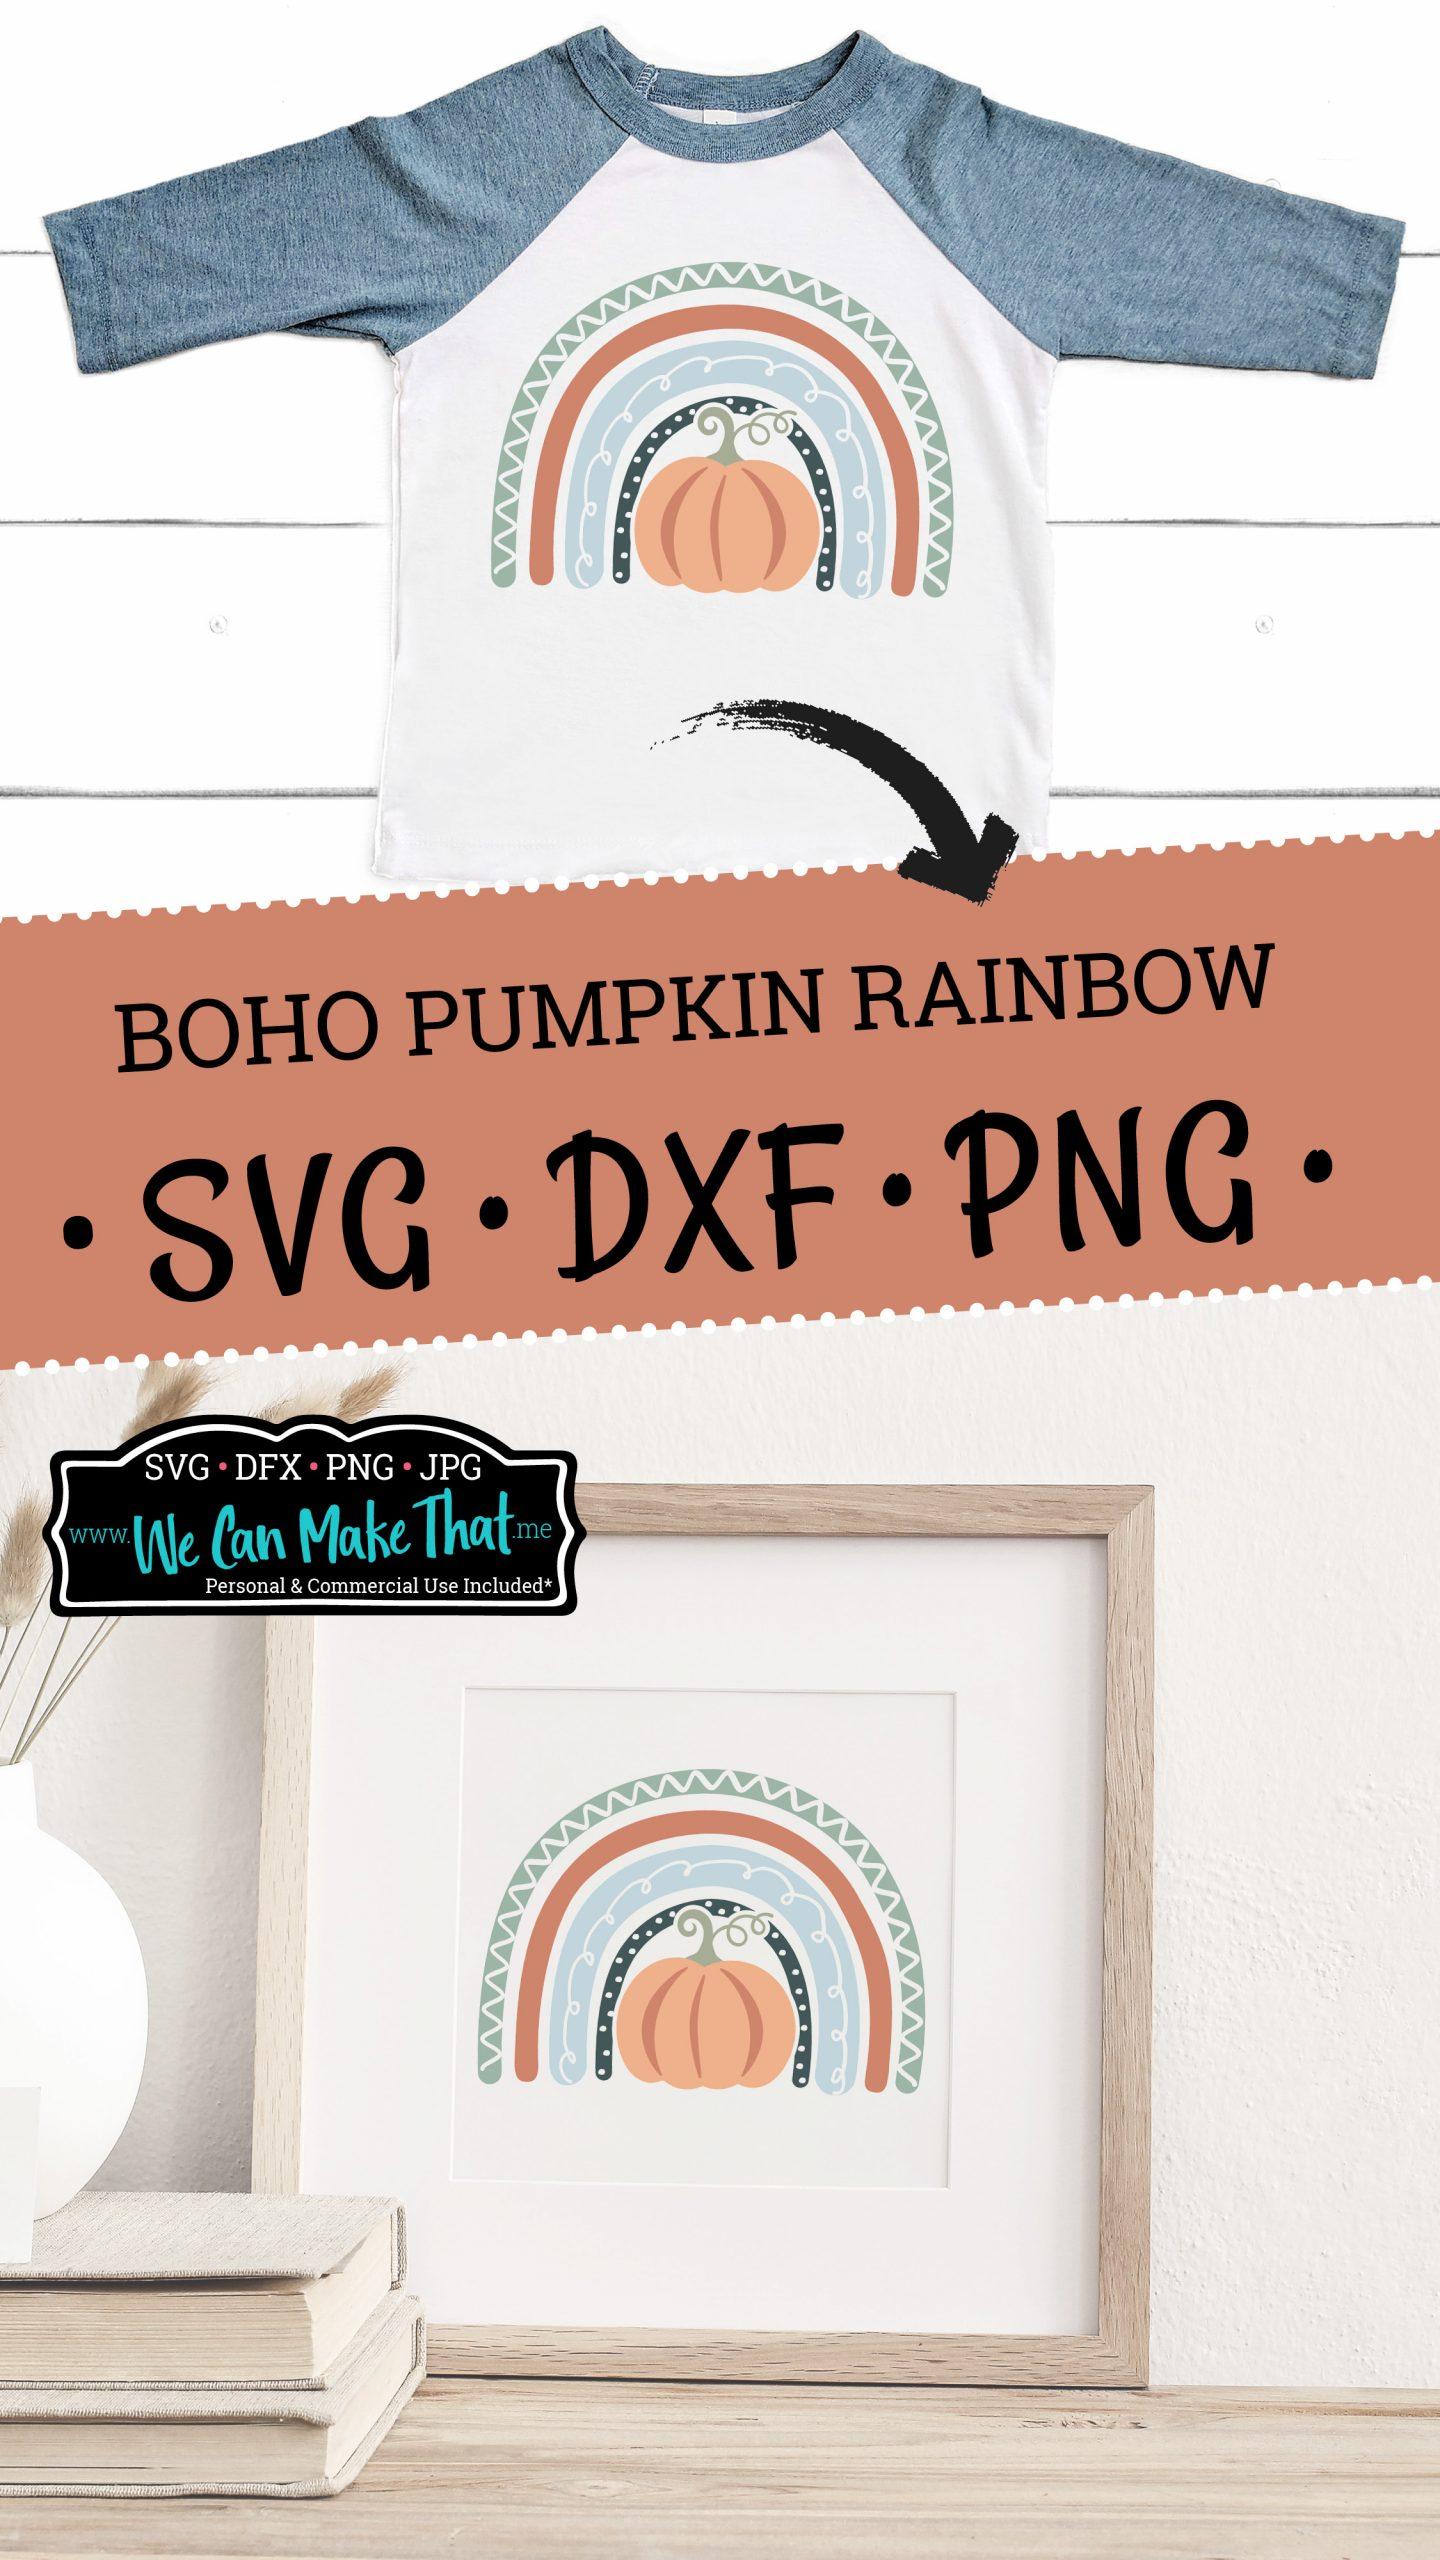 Boho pumpkin rainbow